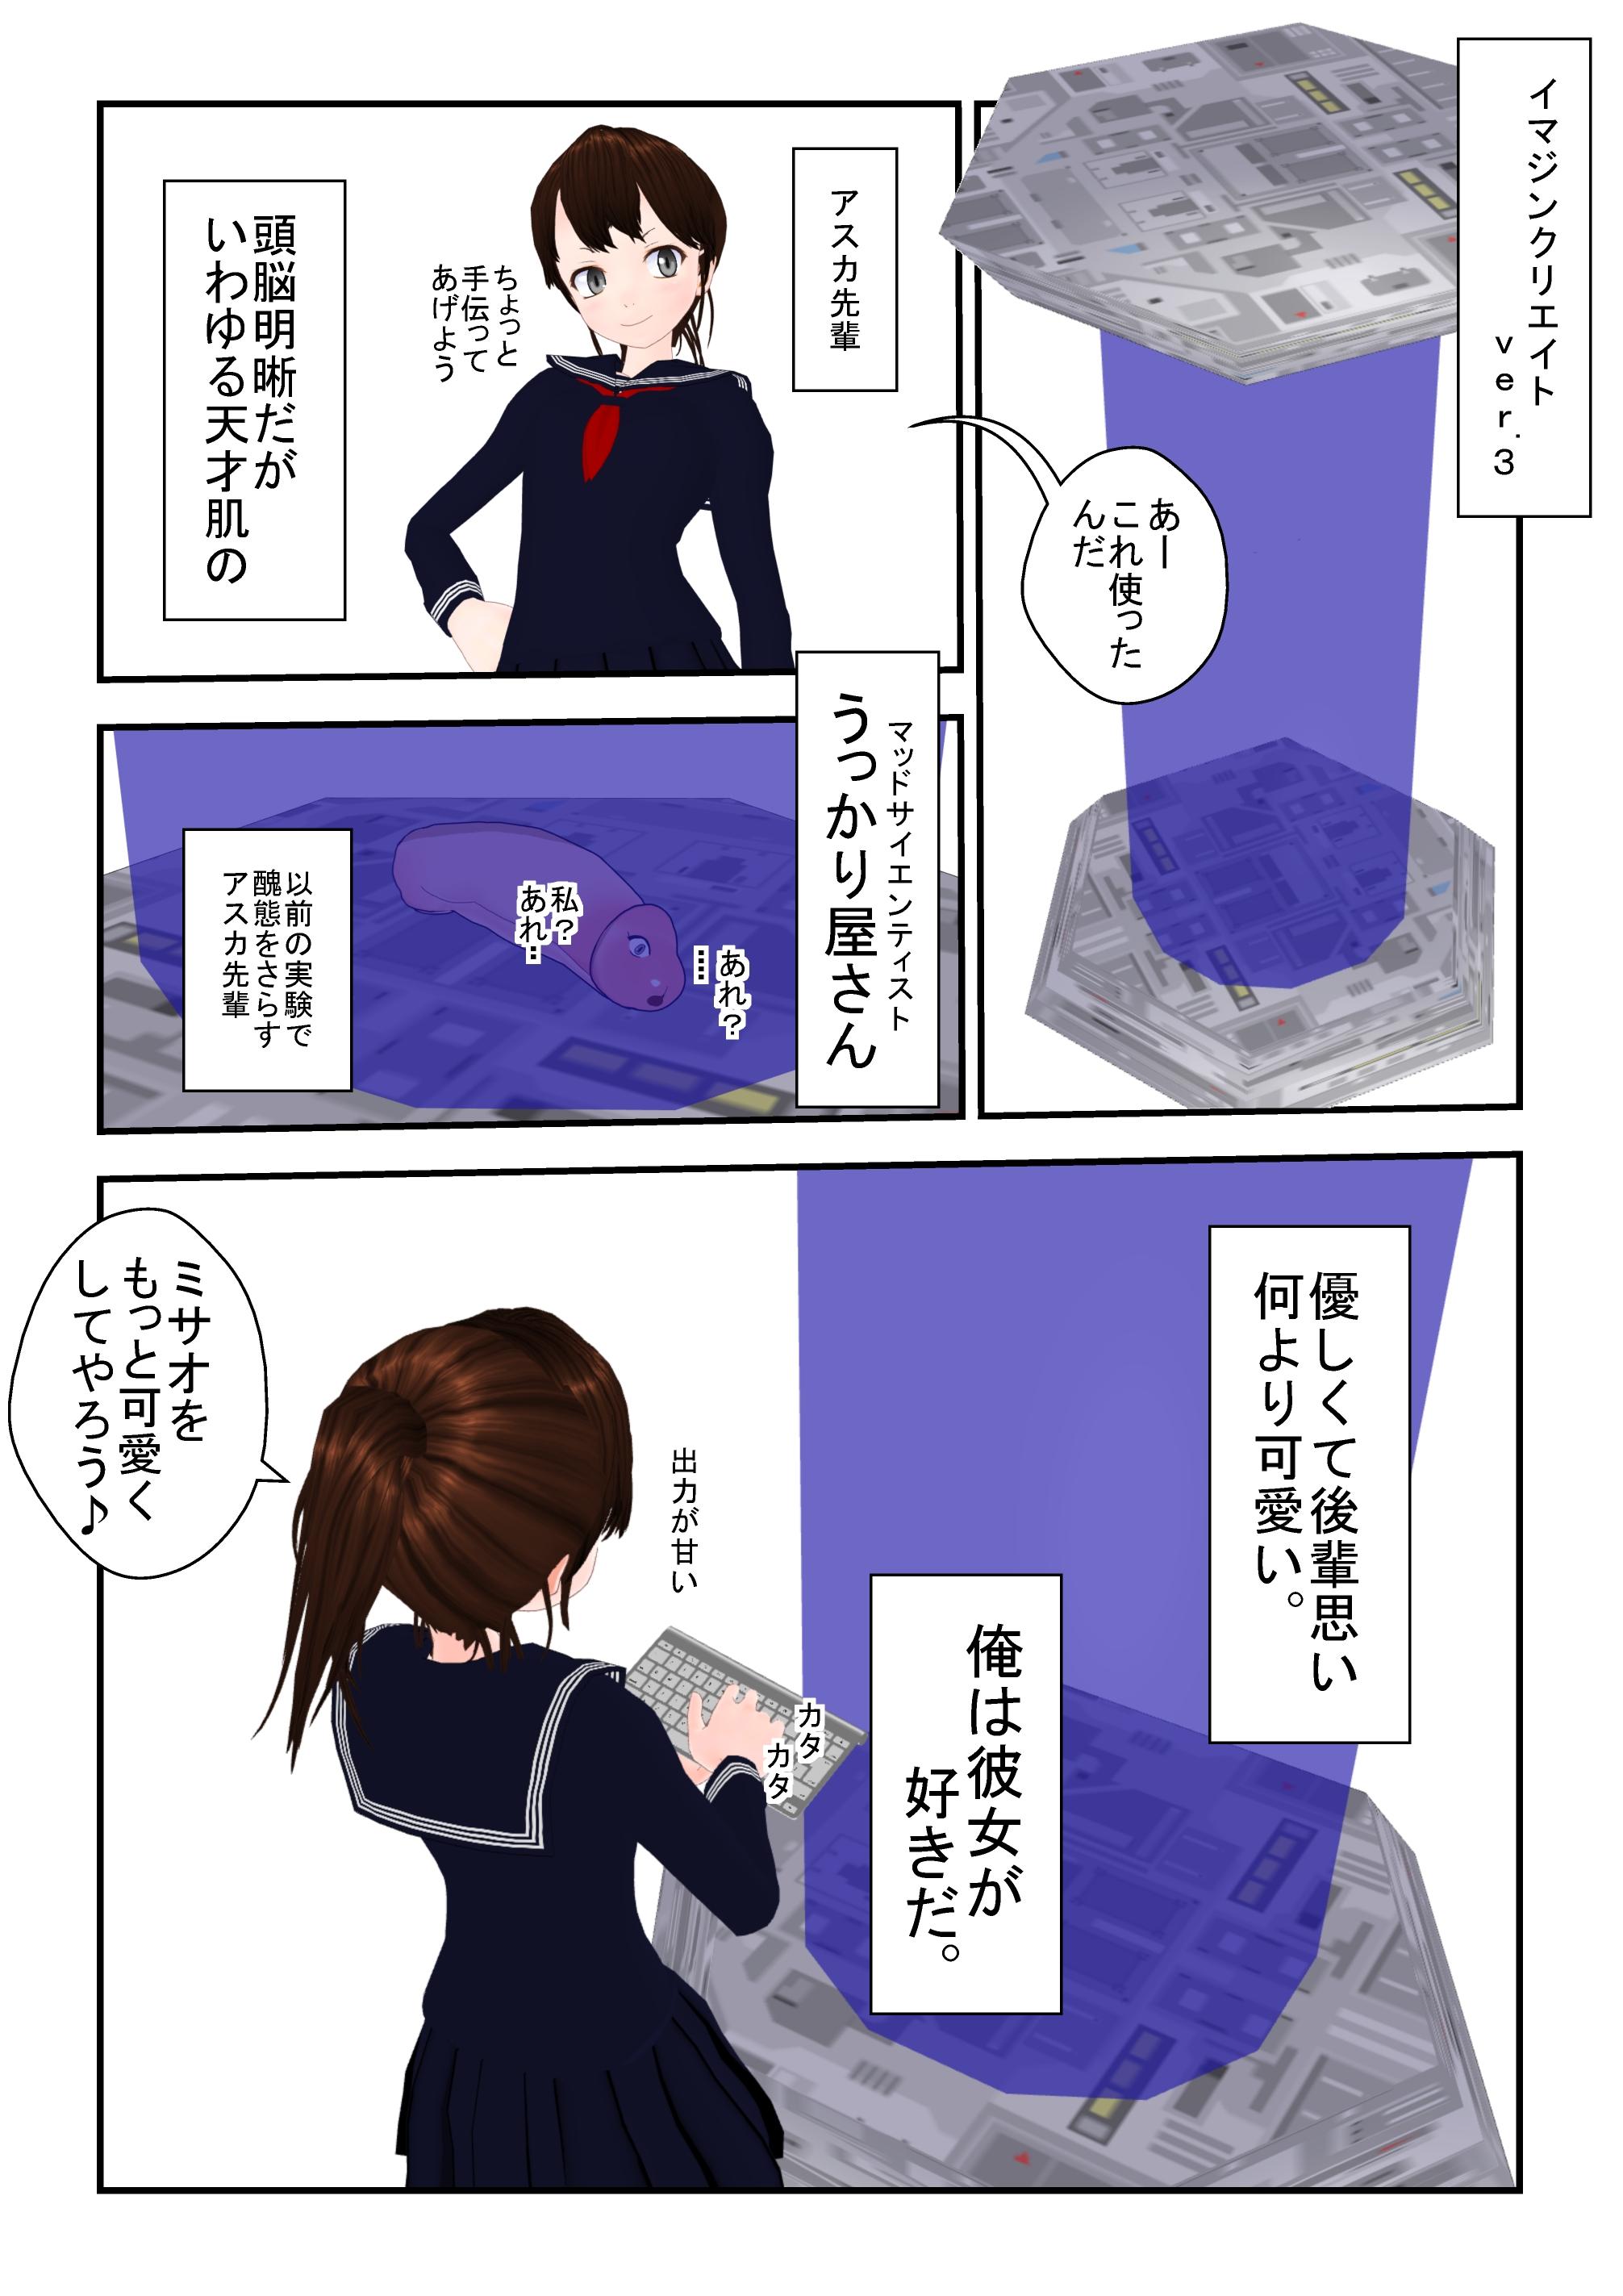 mudai_1_0003.jpg